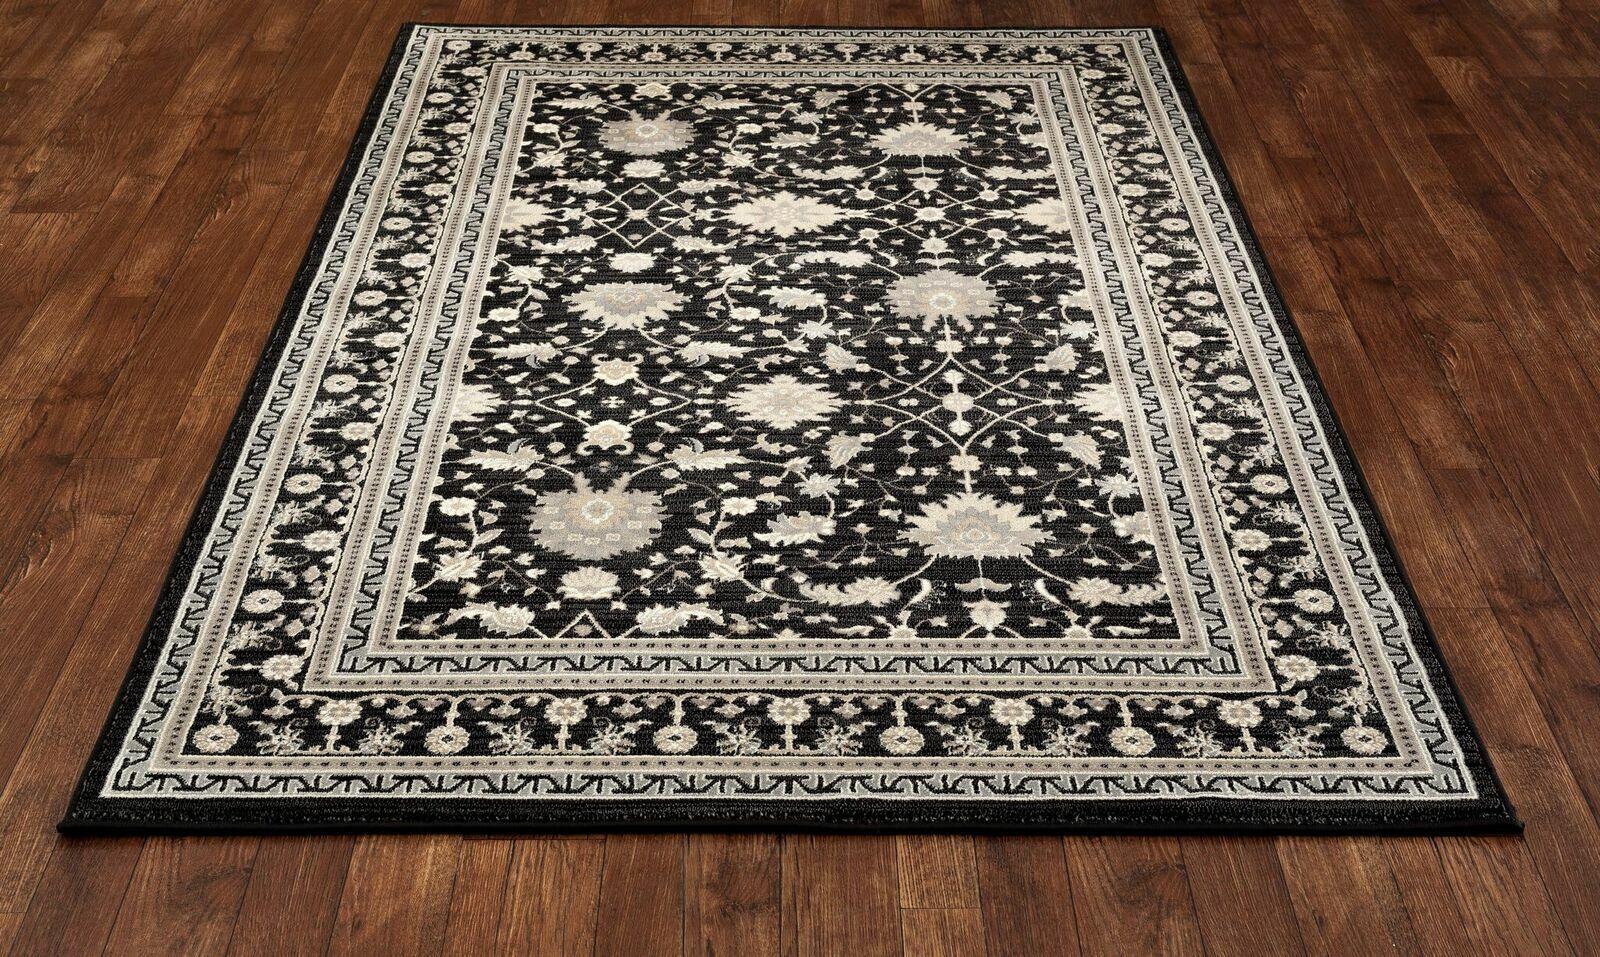 Highland Black/Cream Area Rug Rug Size: 5'3 x 7'7